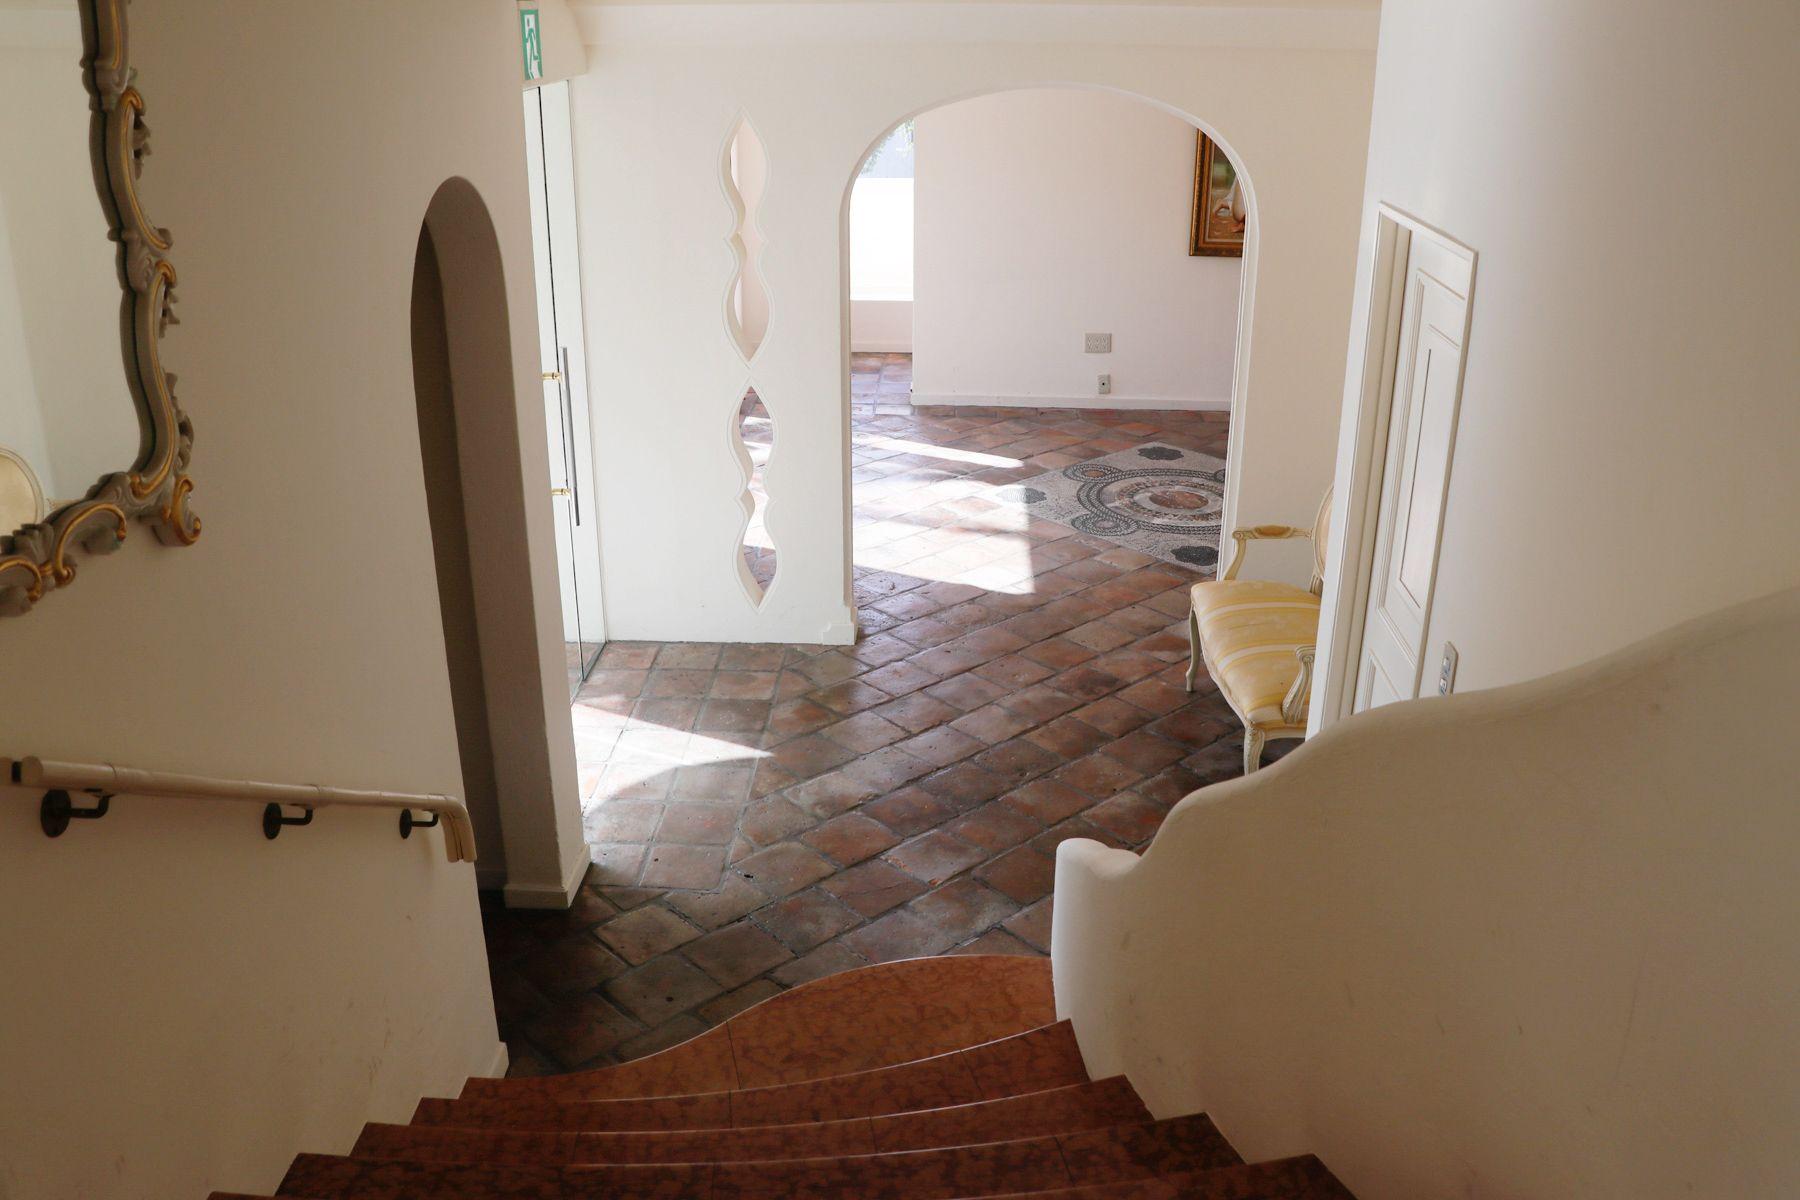 sun studio デルフィオーレ八王子1F ウェイティングルームへの階段